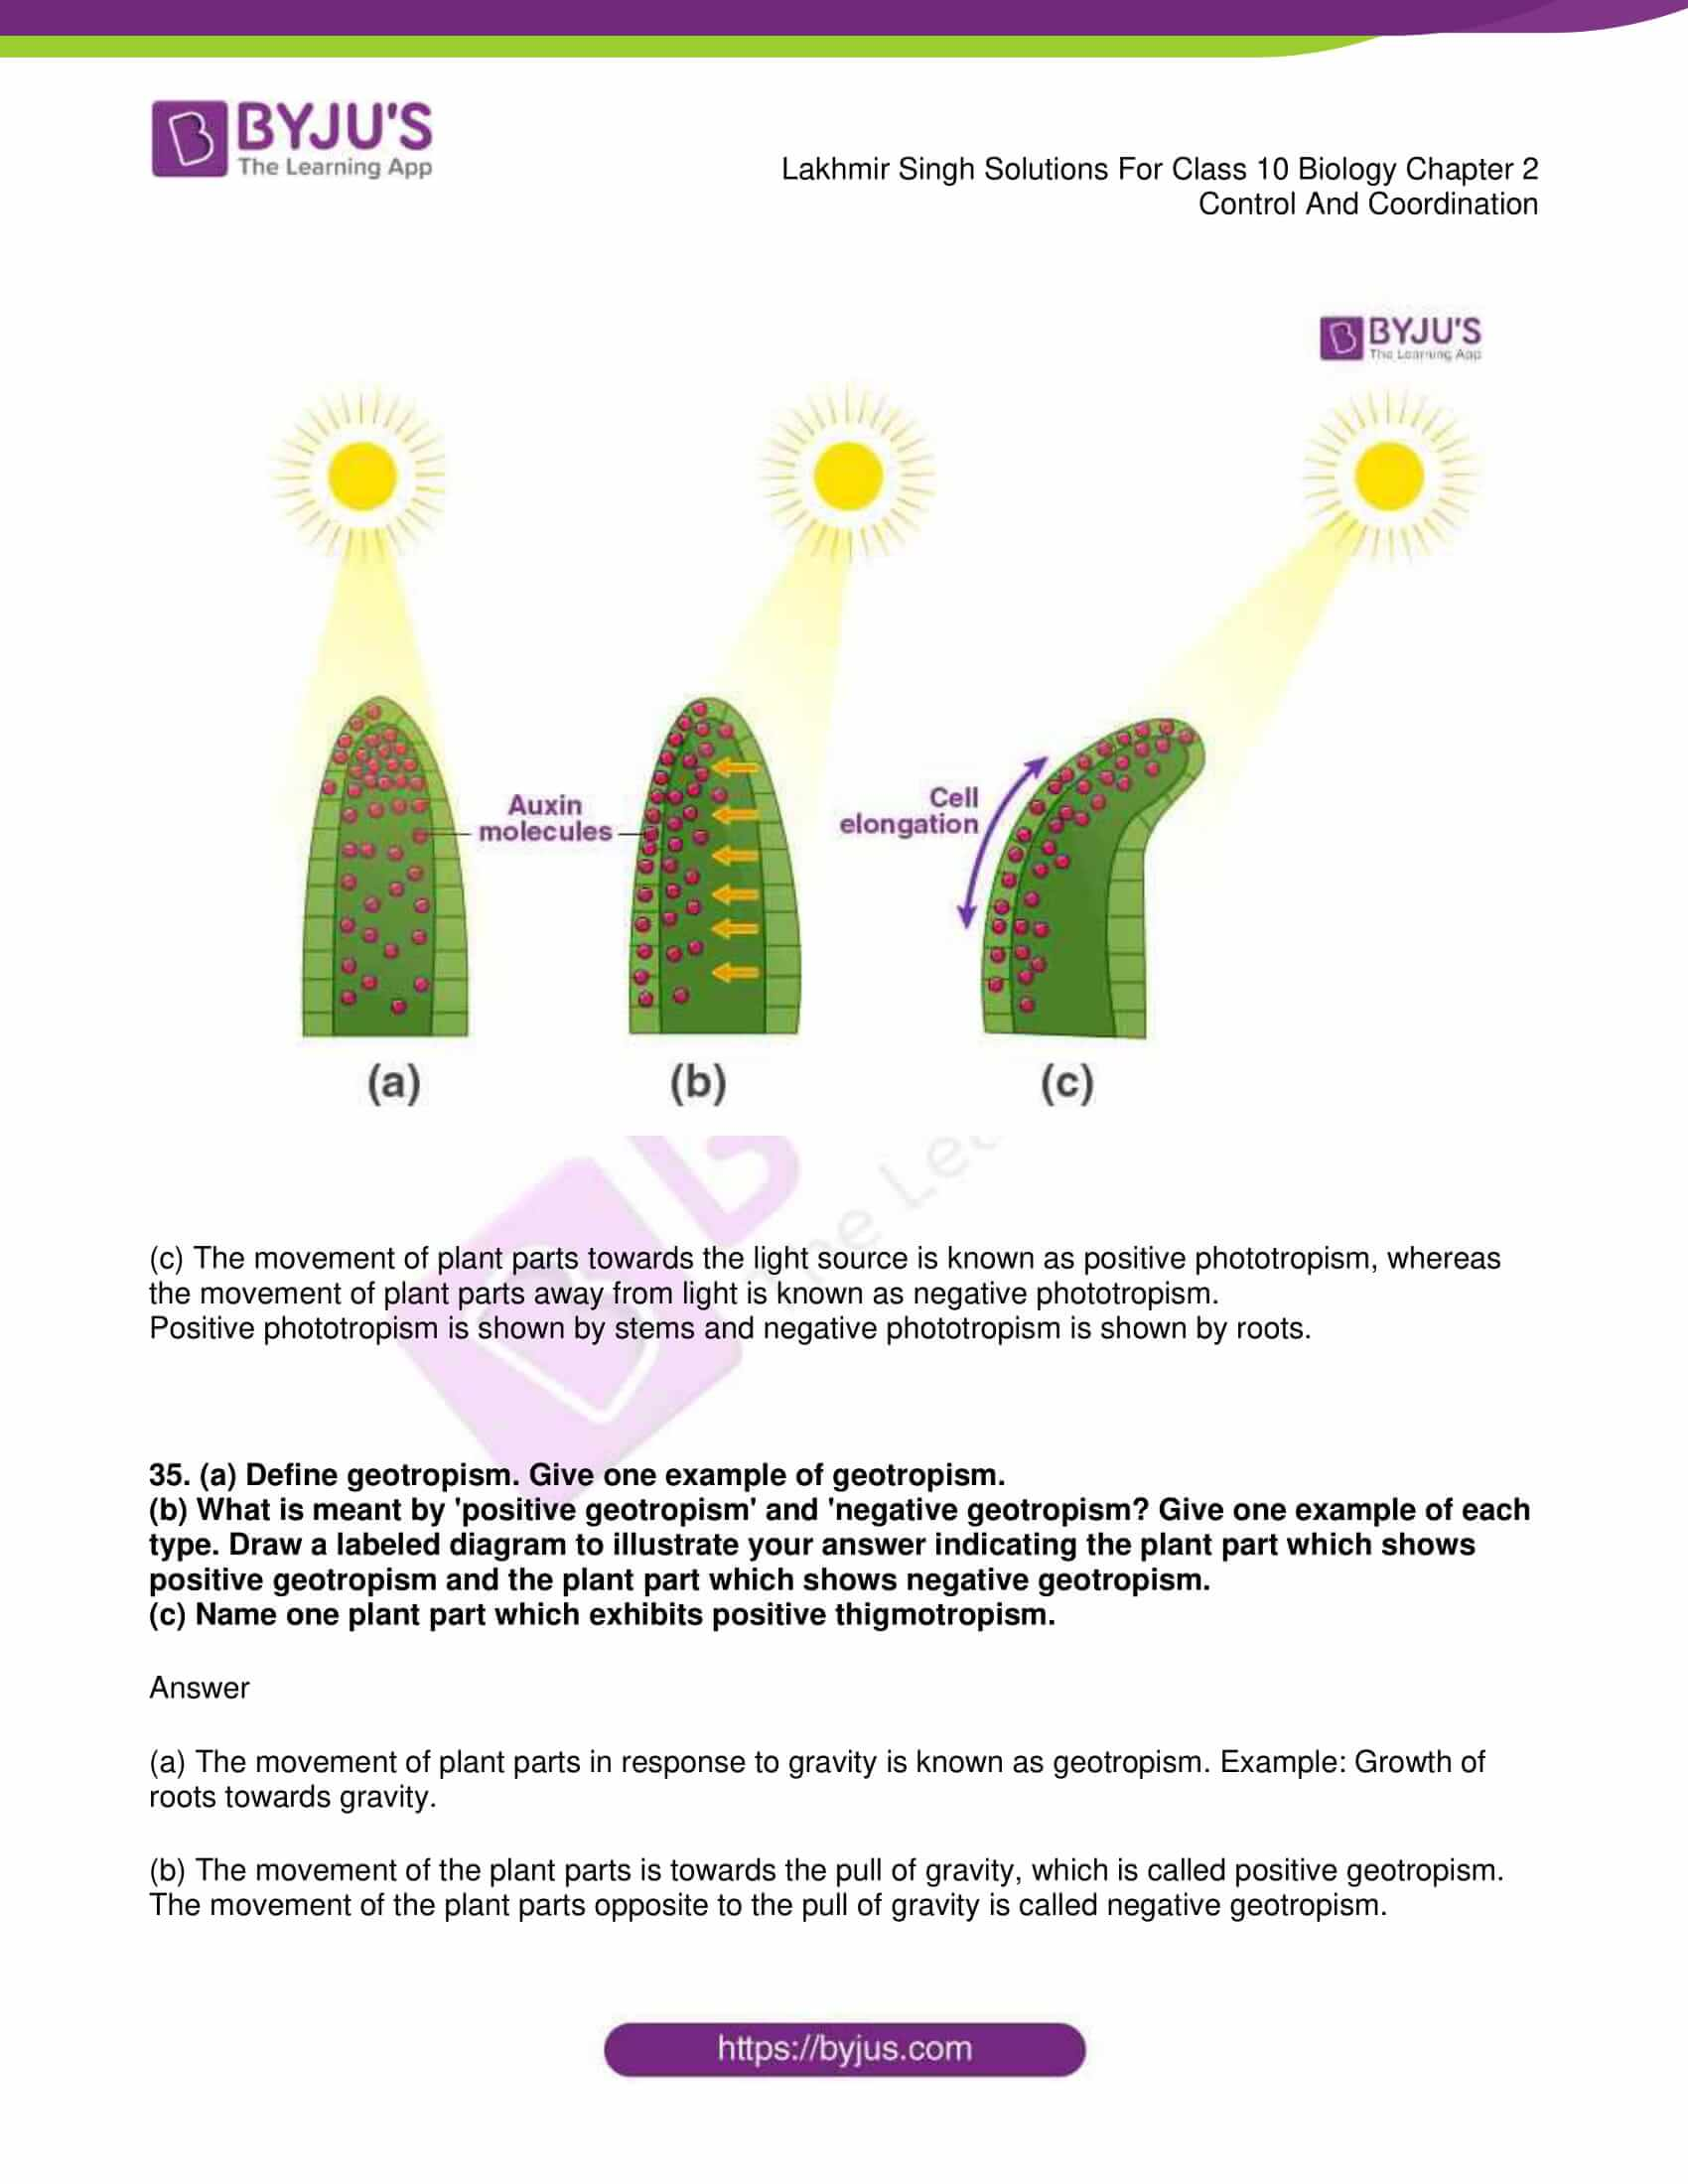 lakhmir singh sol class 10 biology chapter 2 11